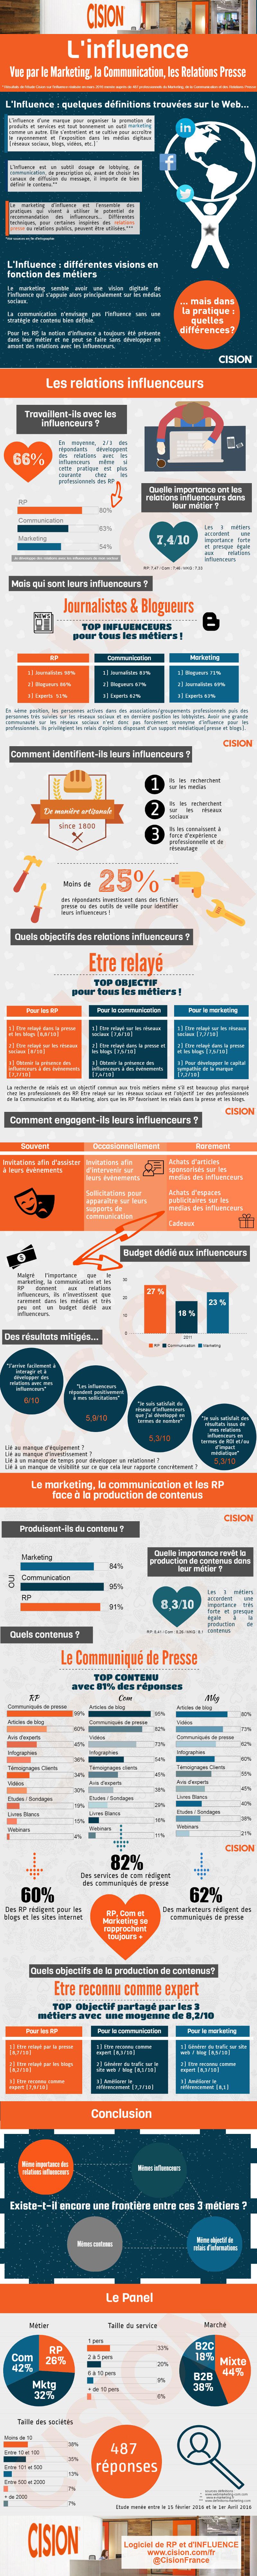 Influenceurs-Marketing-rp-et-communication